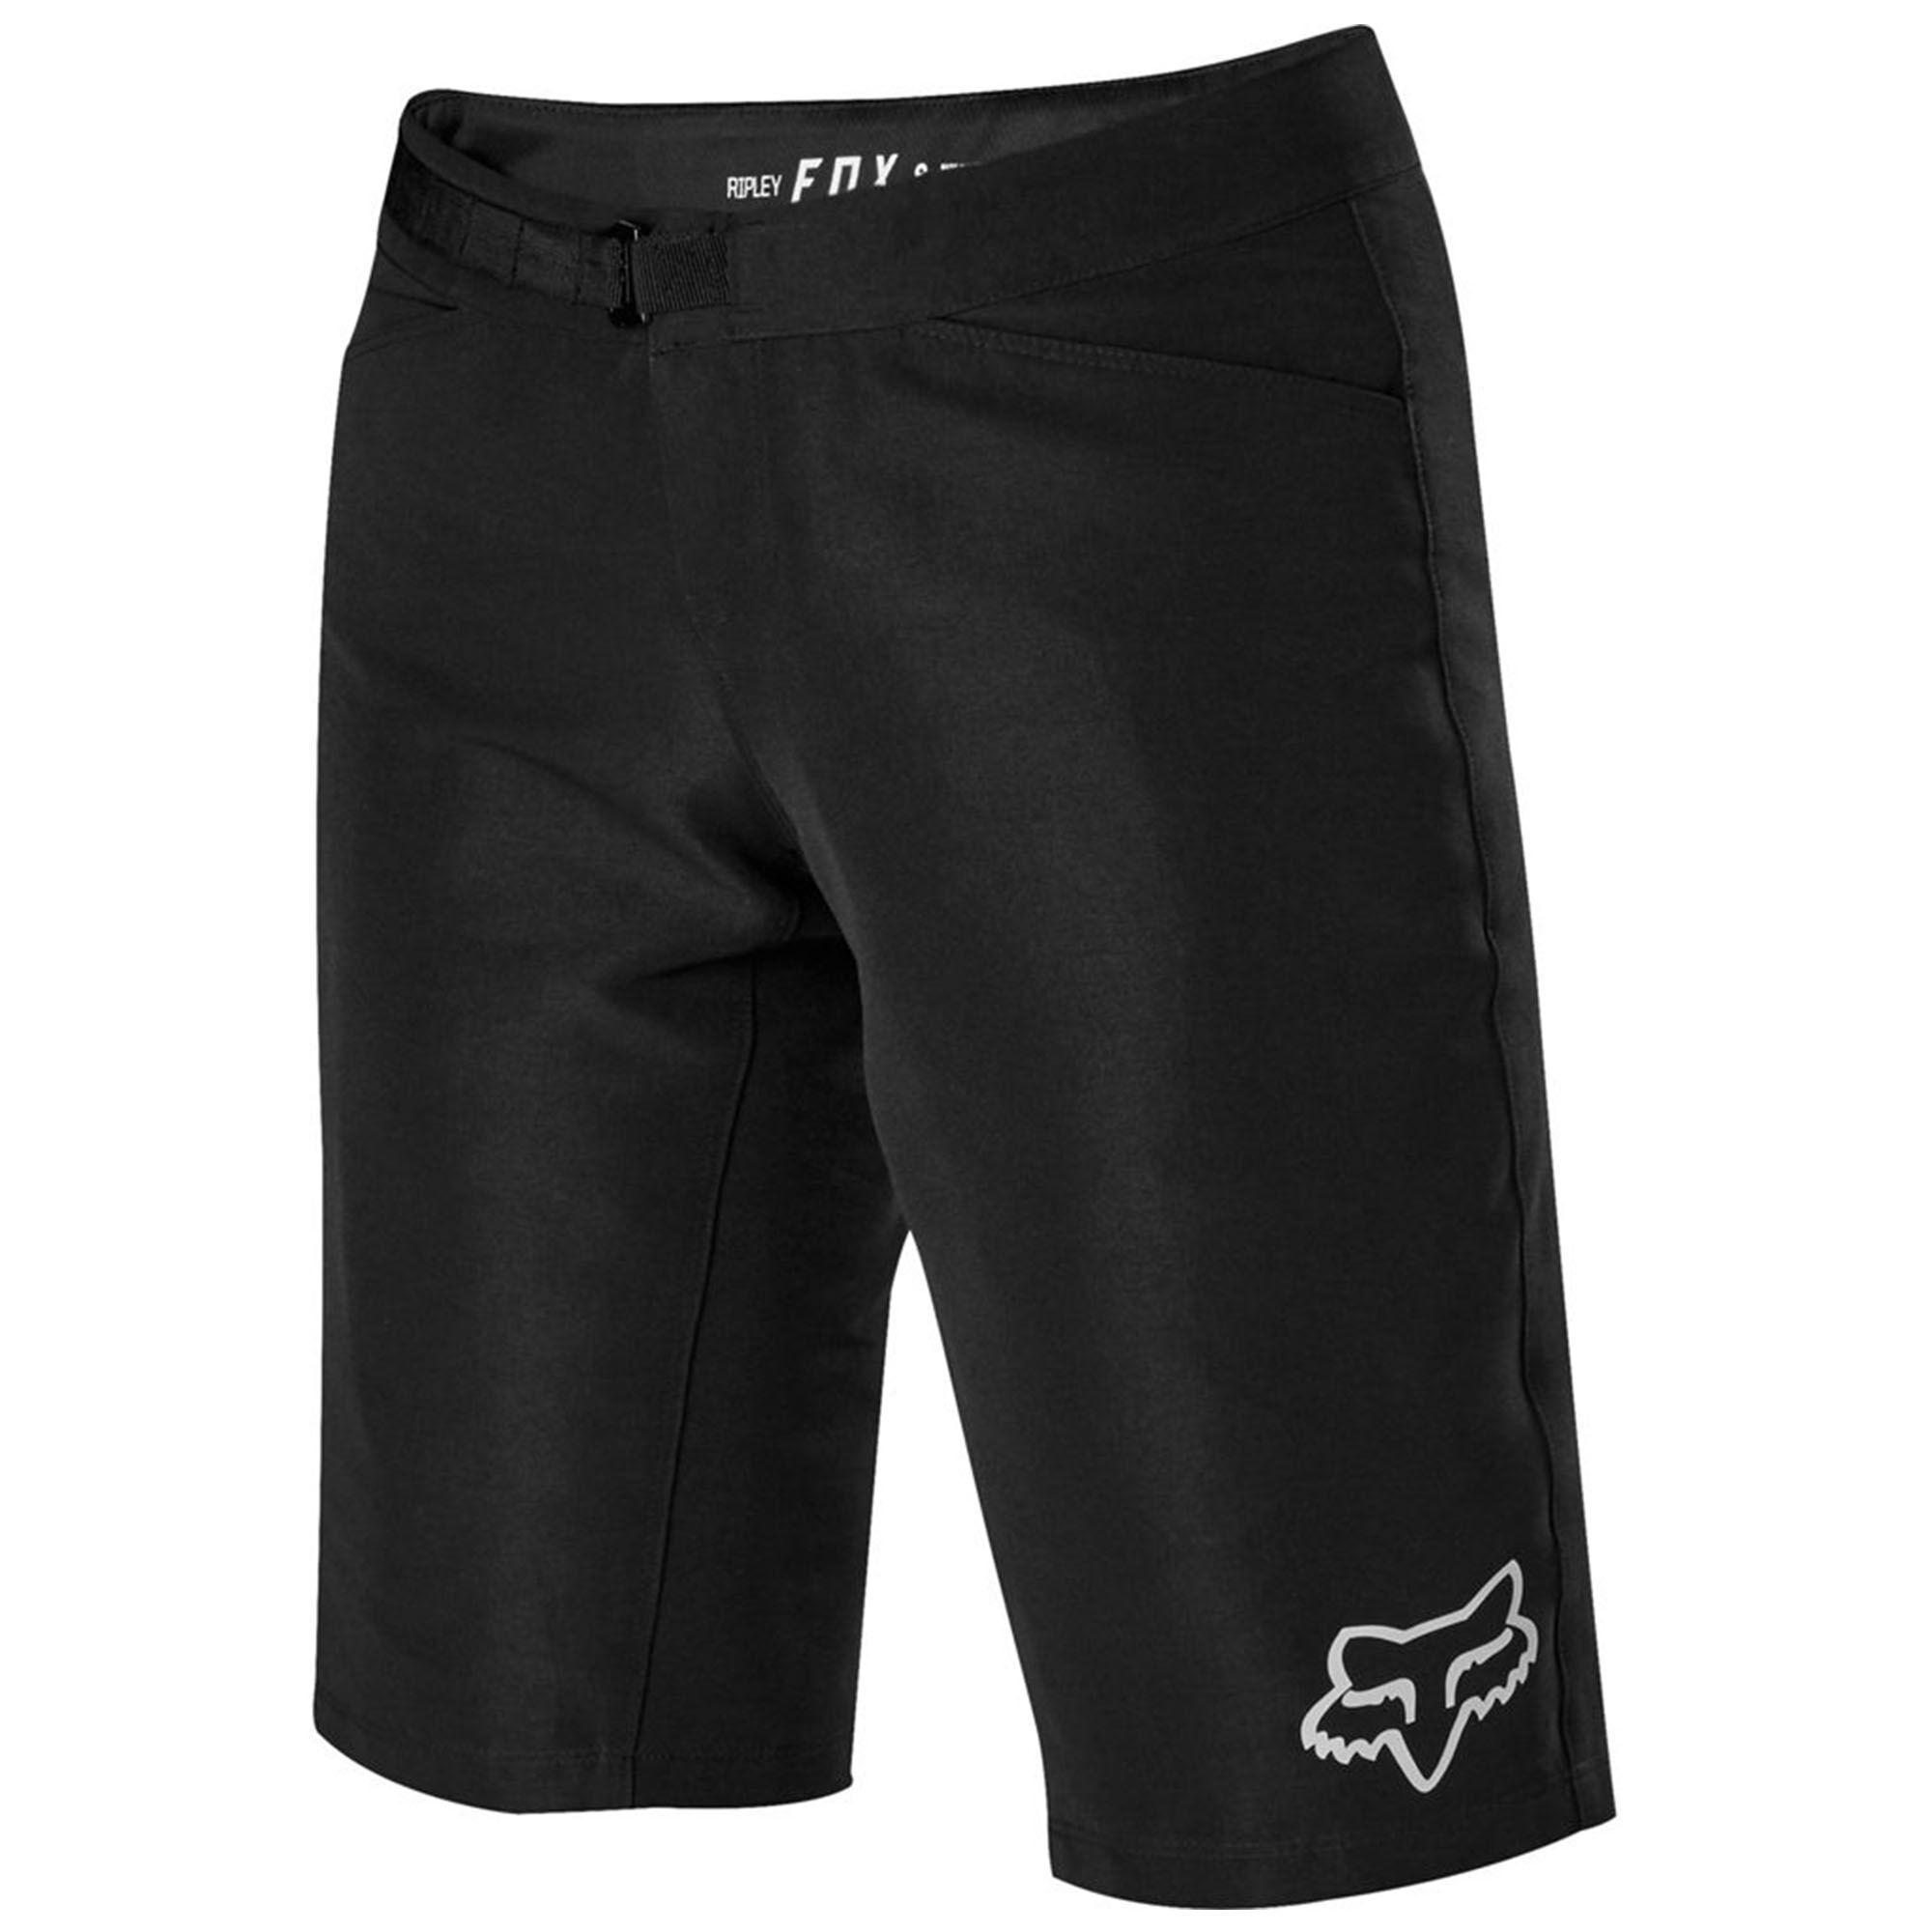 Fox Women's Ranger Cycling Shorts  - Dirt - Size: Large